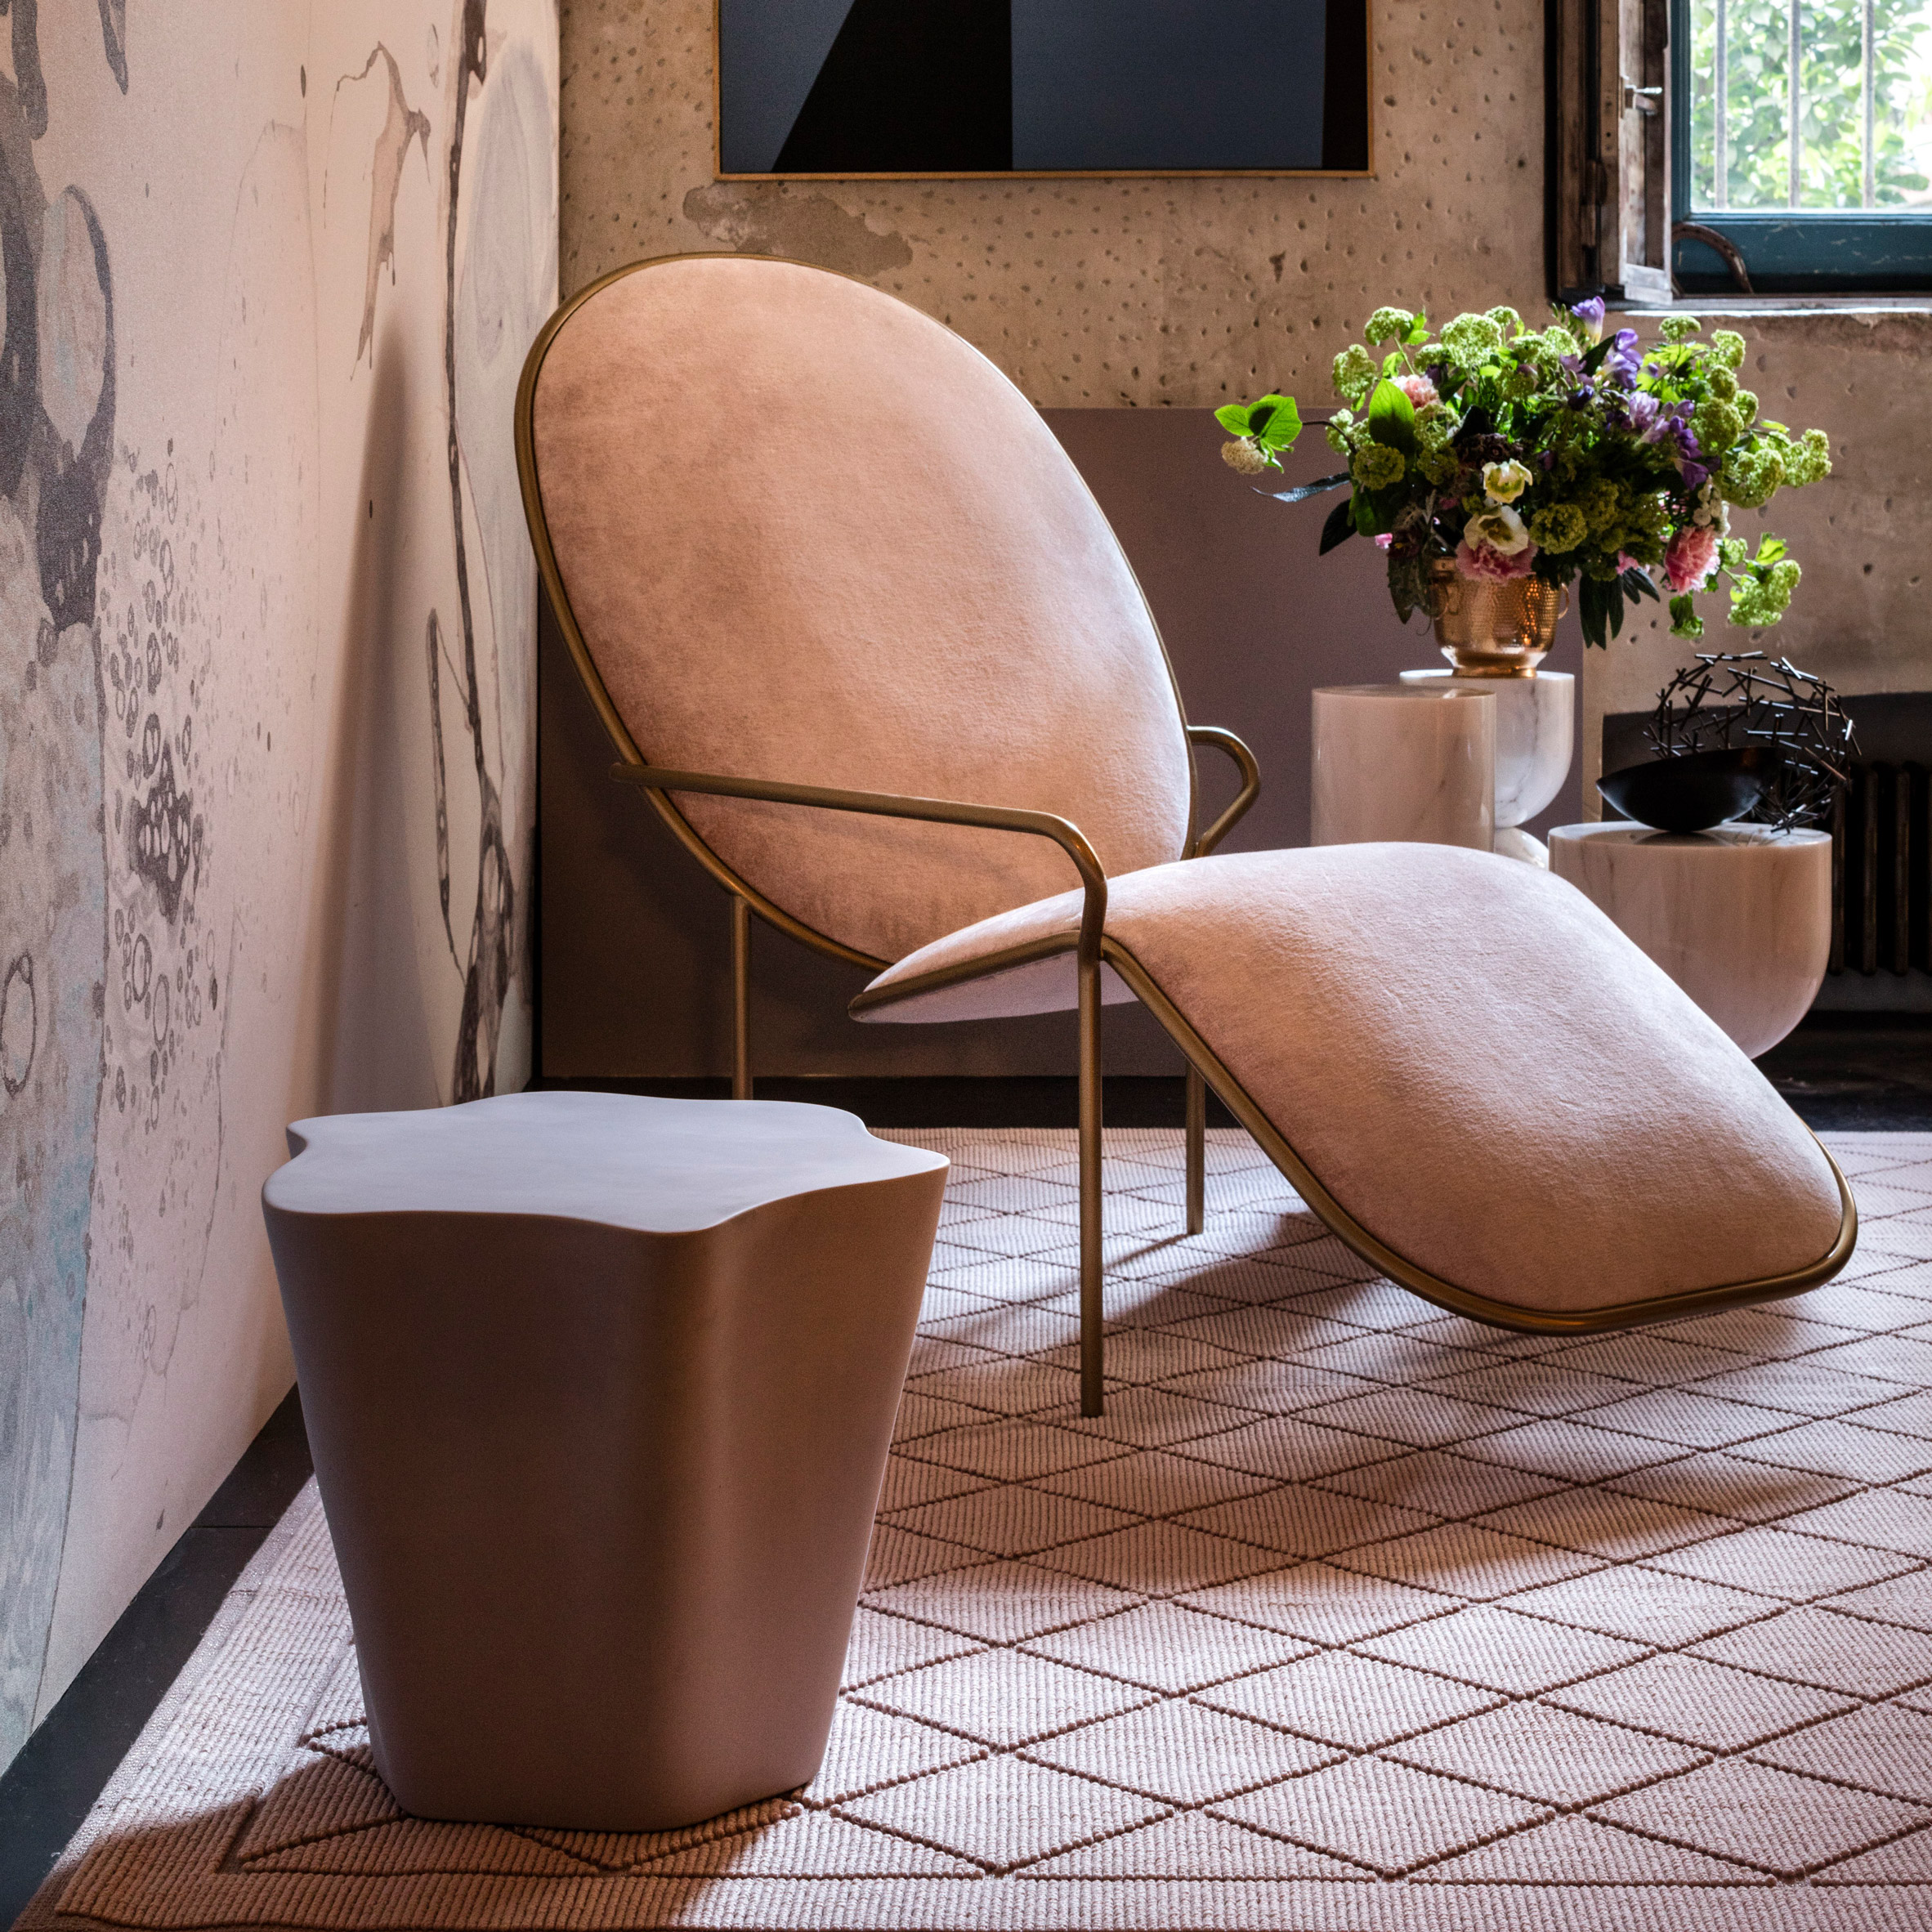 10 furniture designs from Milan 2017 that showcase millennial pink